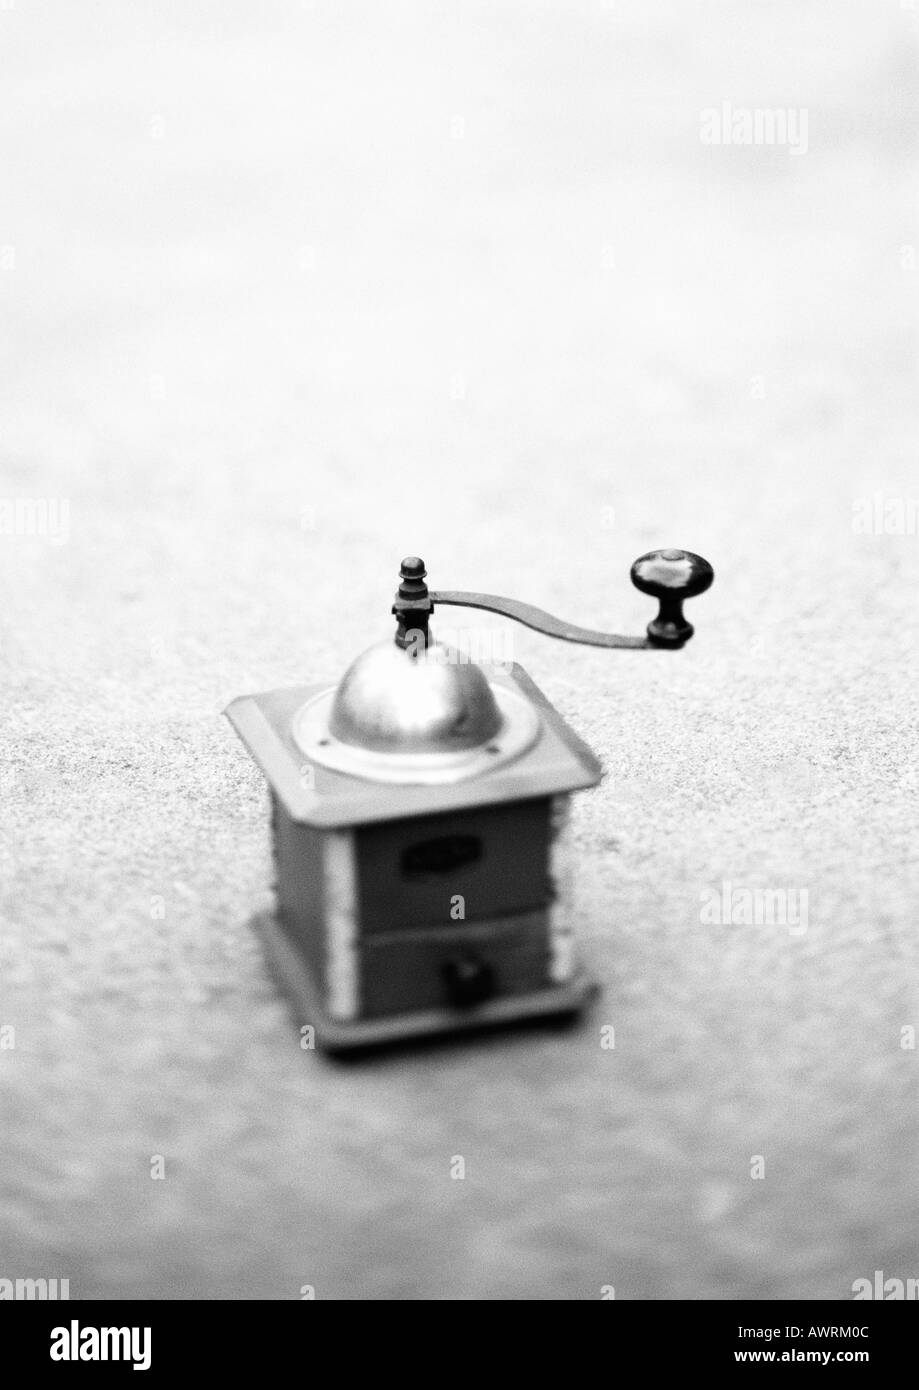 Coffee grinder, b&w. - Stock Image